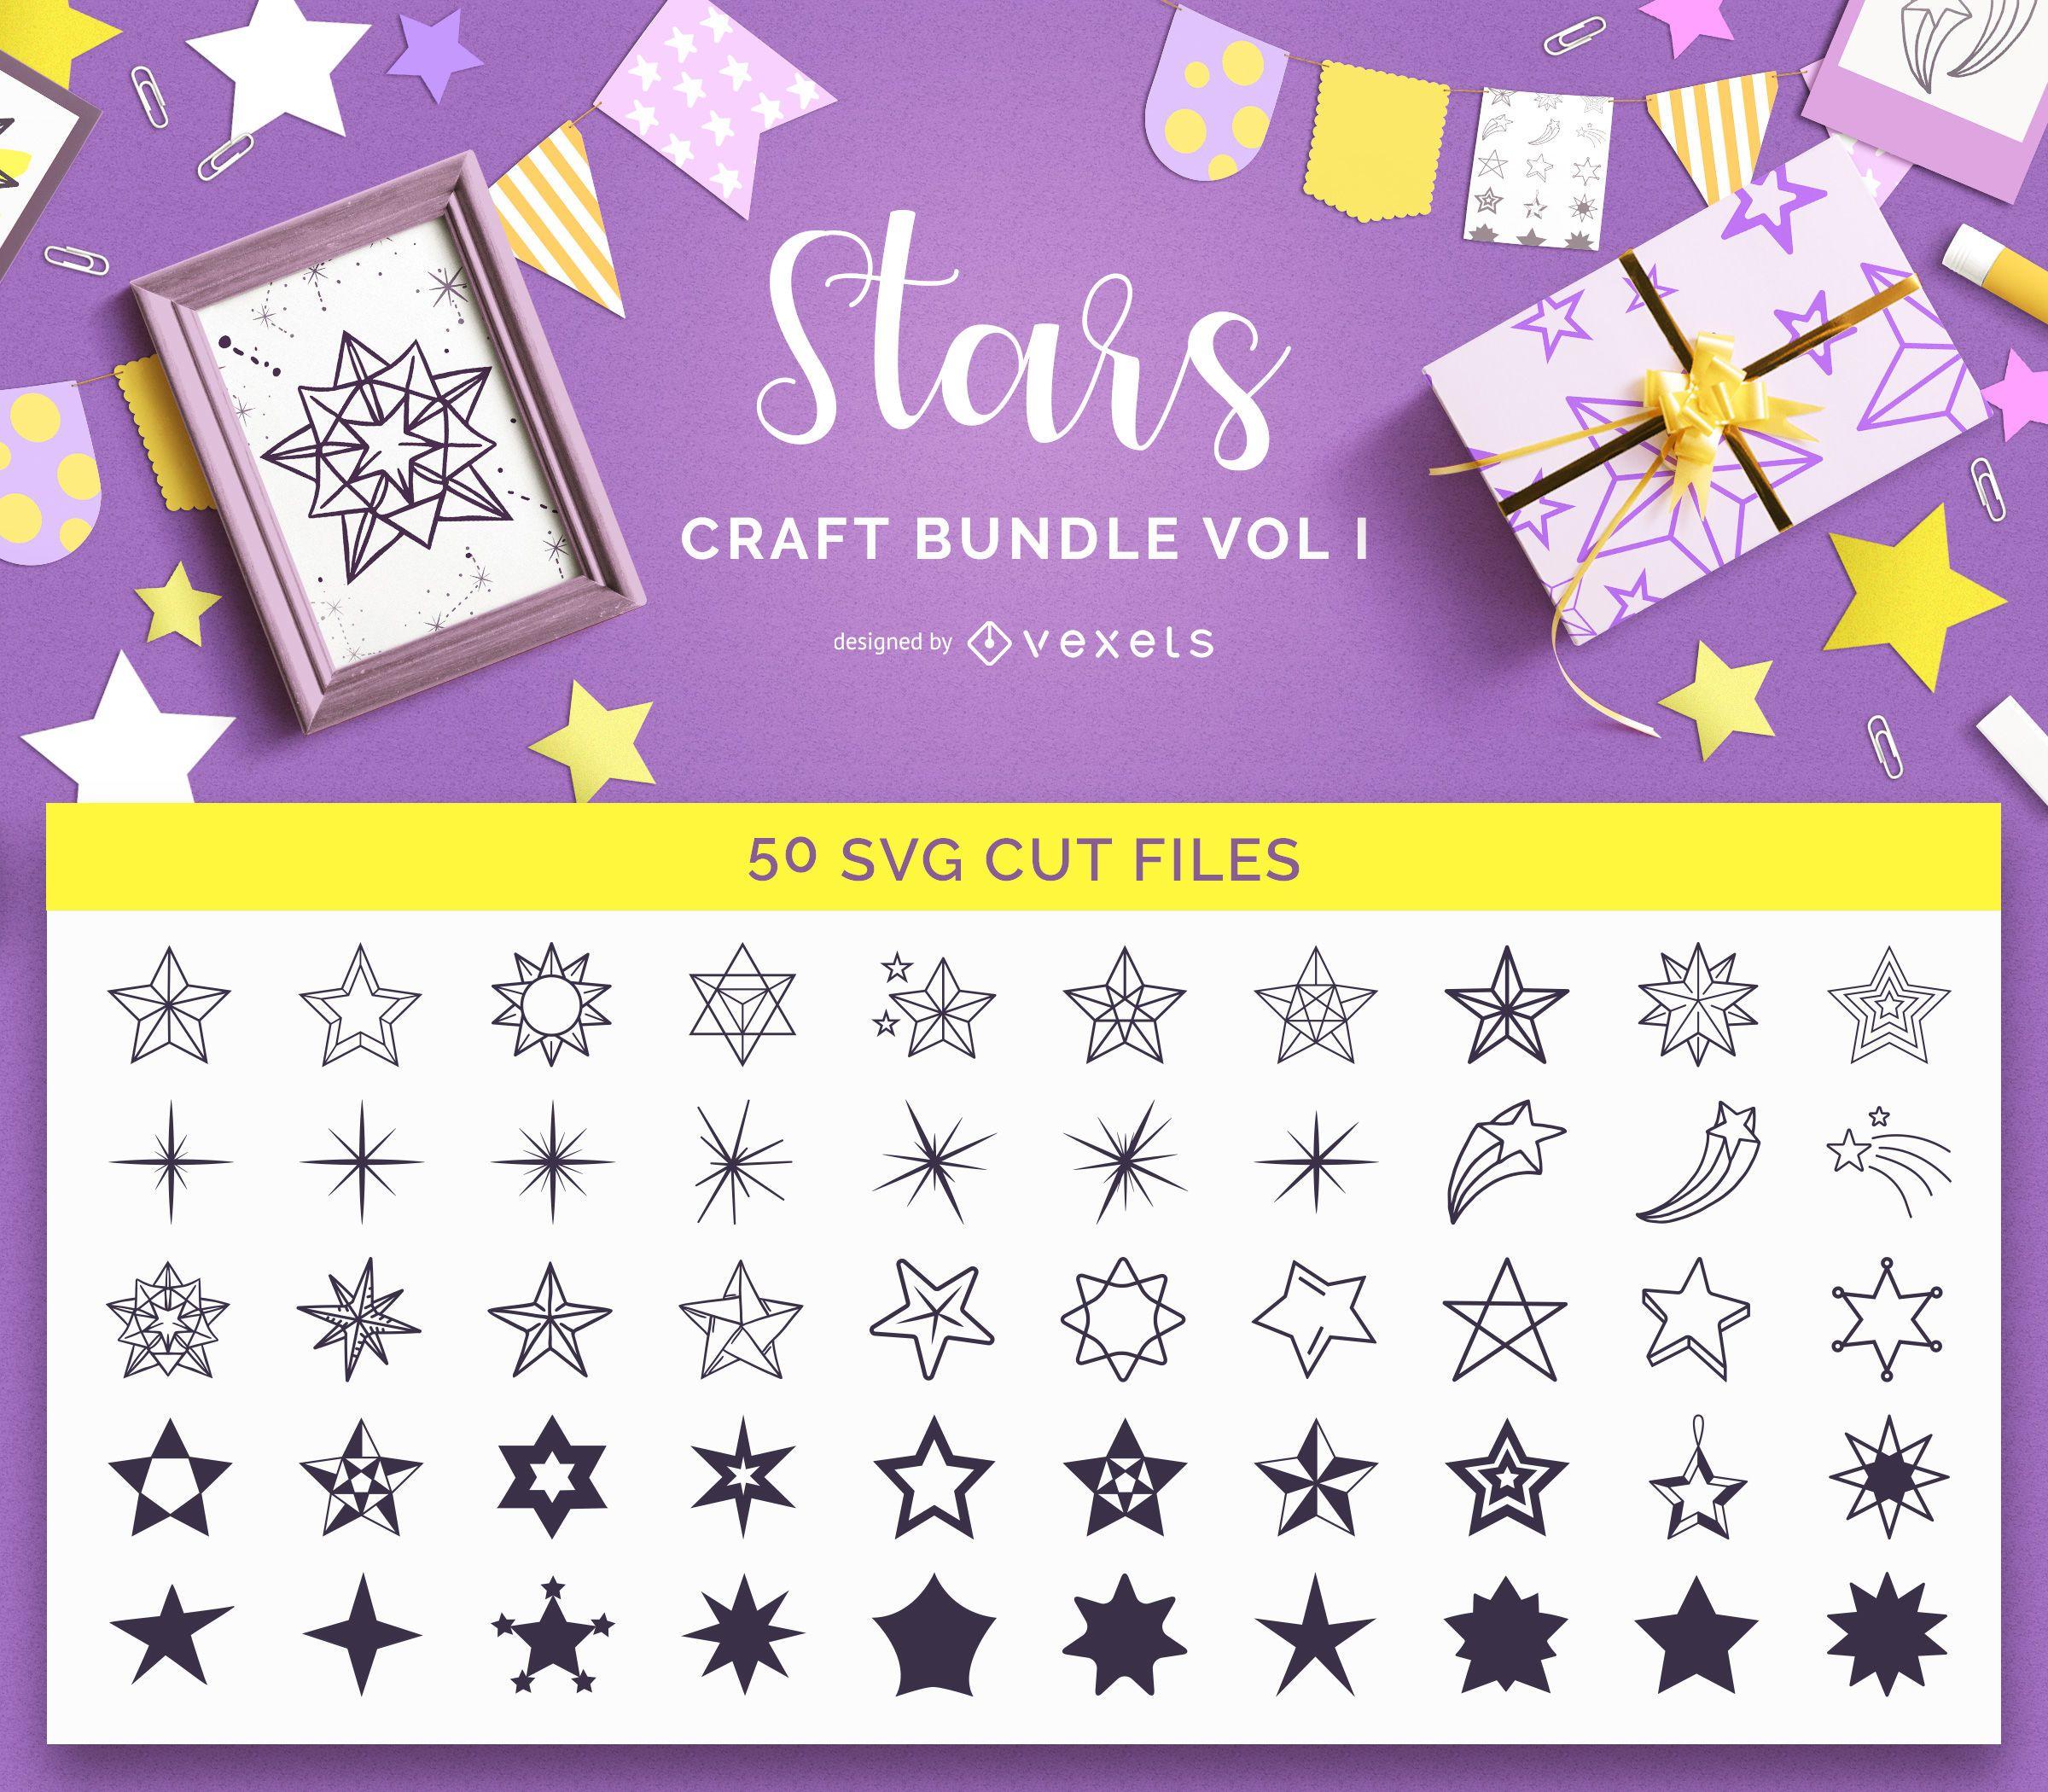 Paquete Stars Craft Vol I